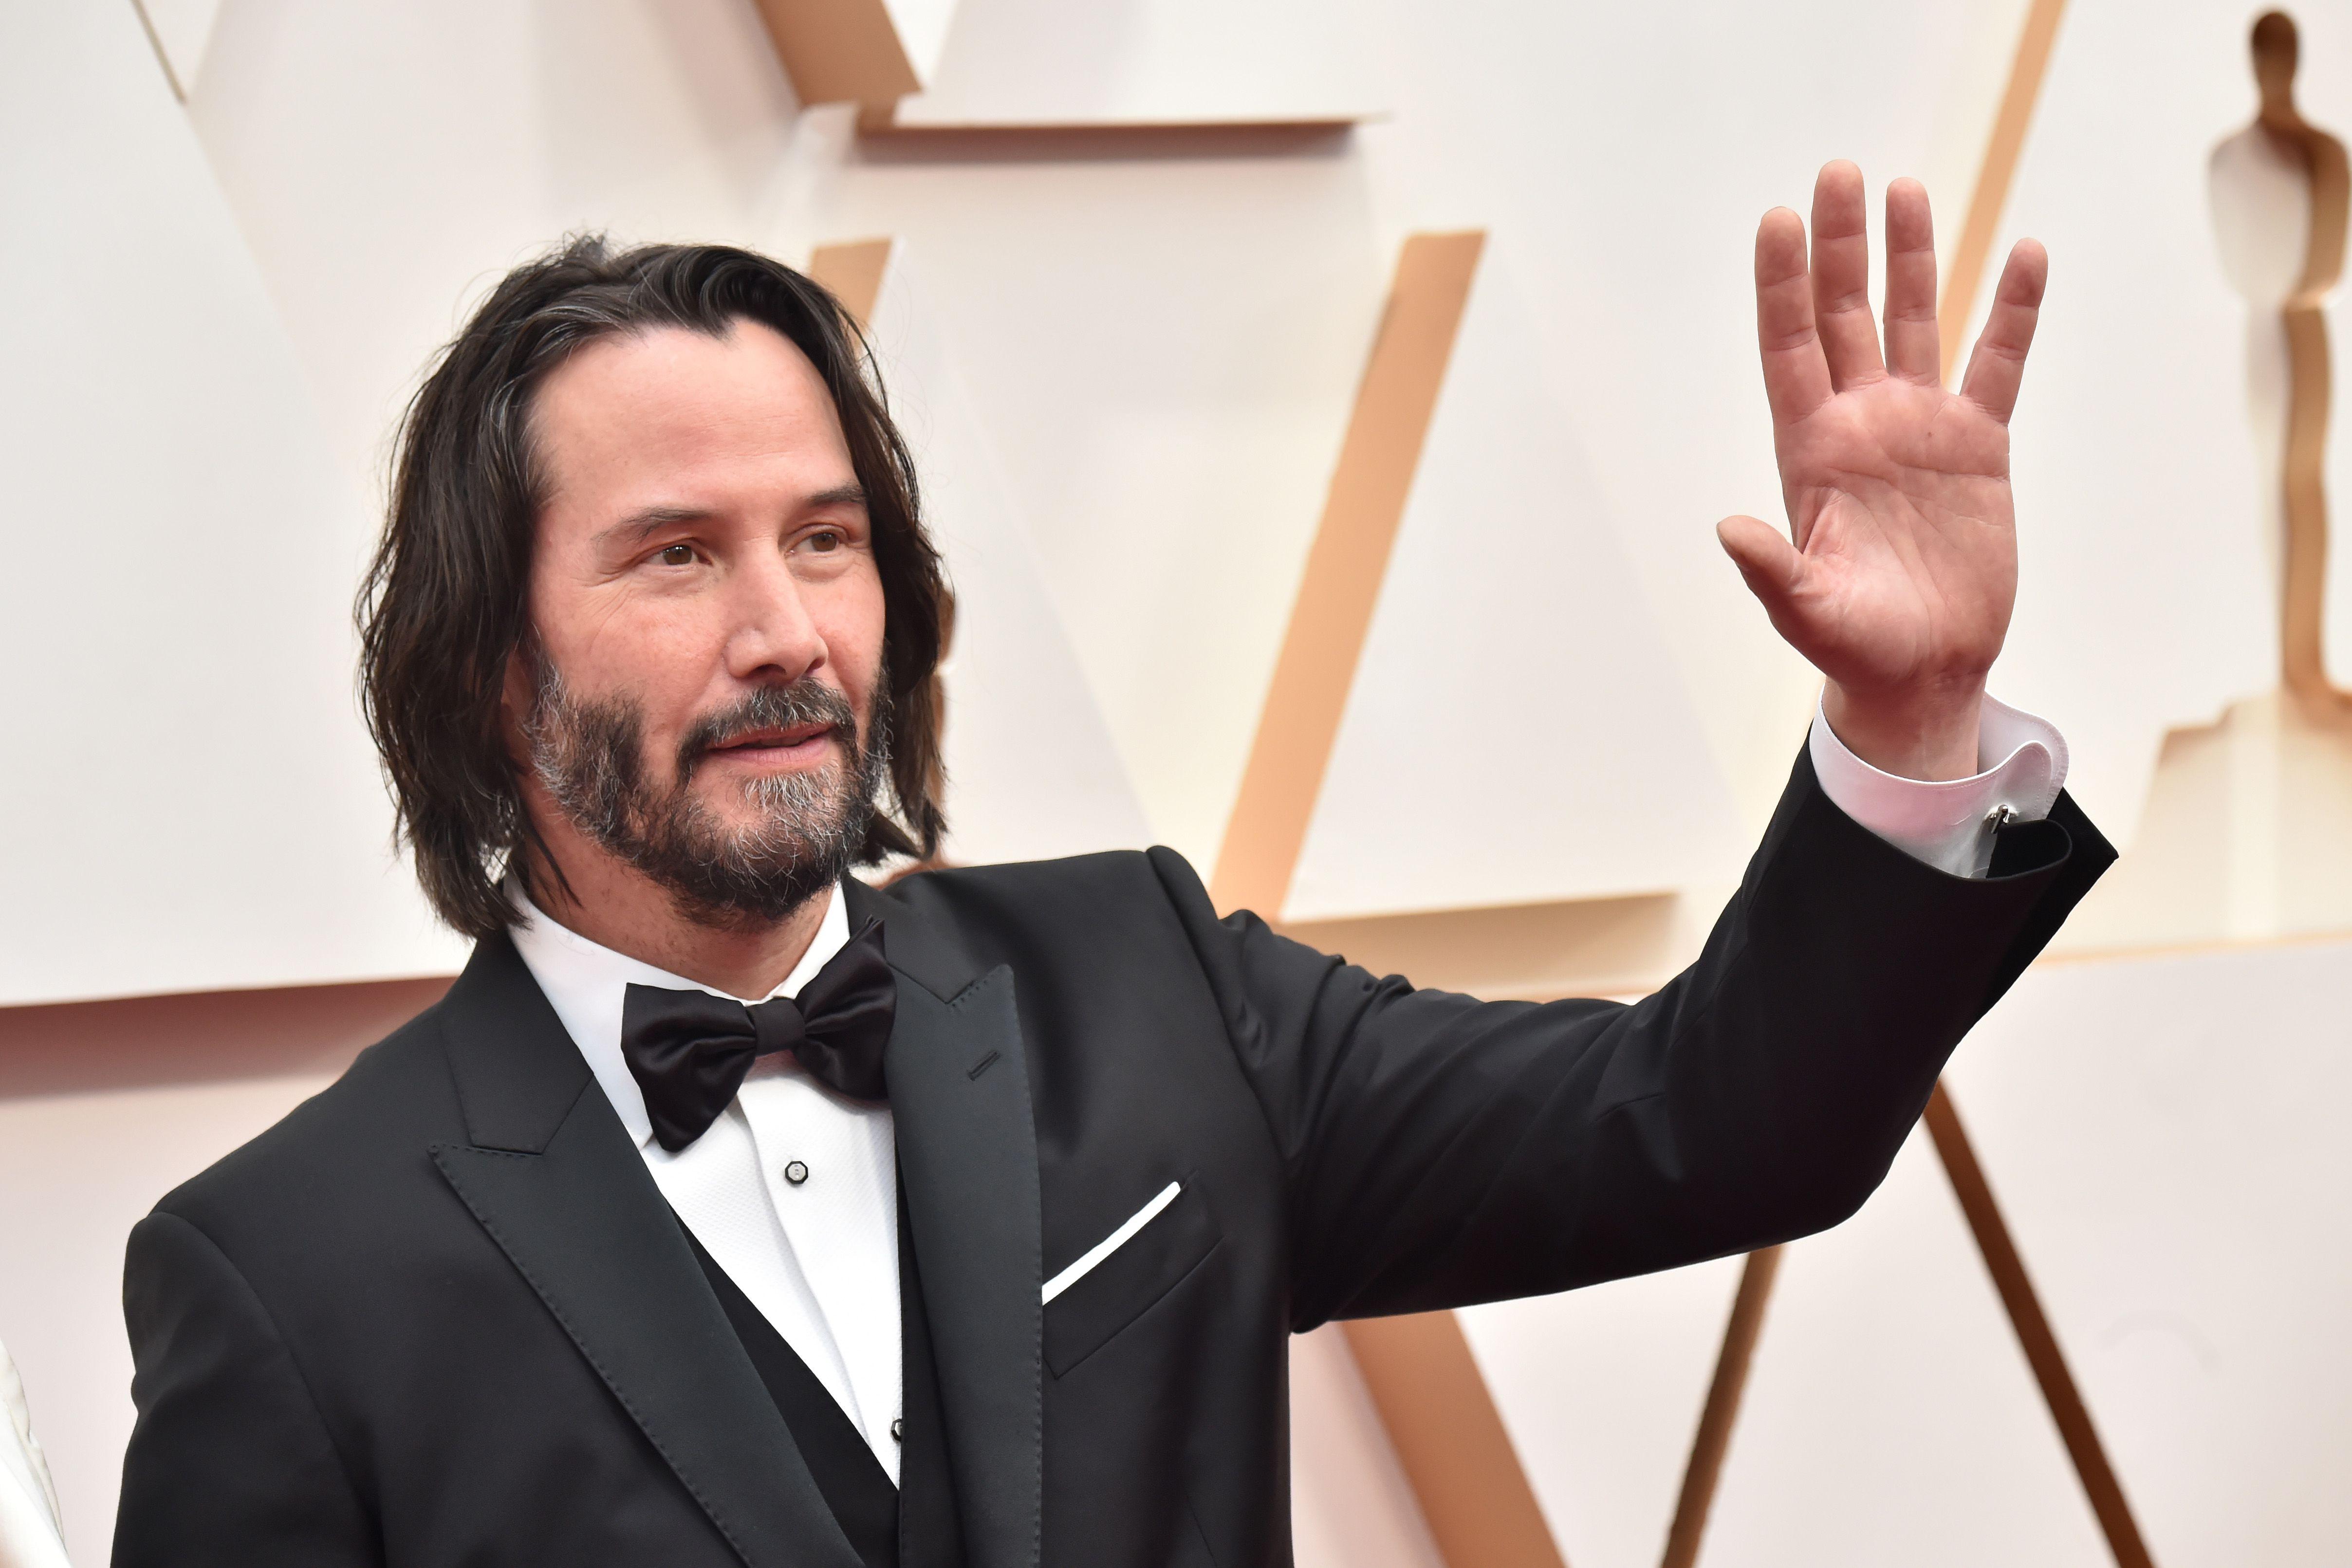 Black Tux King Keanu Reeves Won The Black Tux Award At The 2020 Oscars